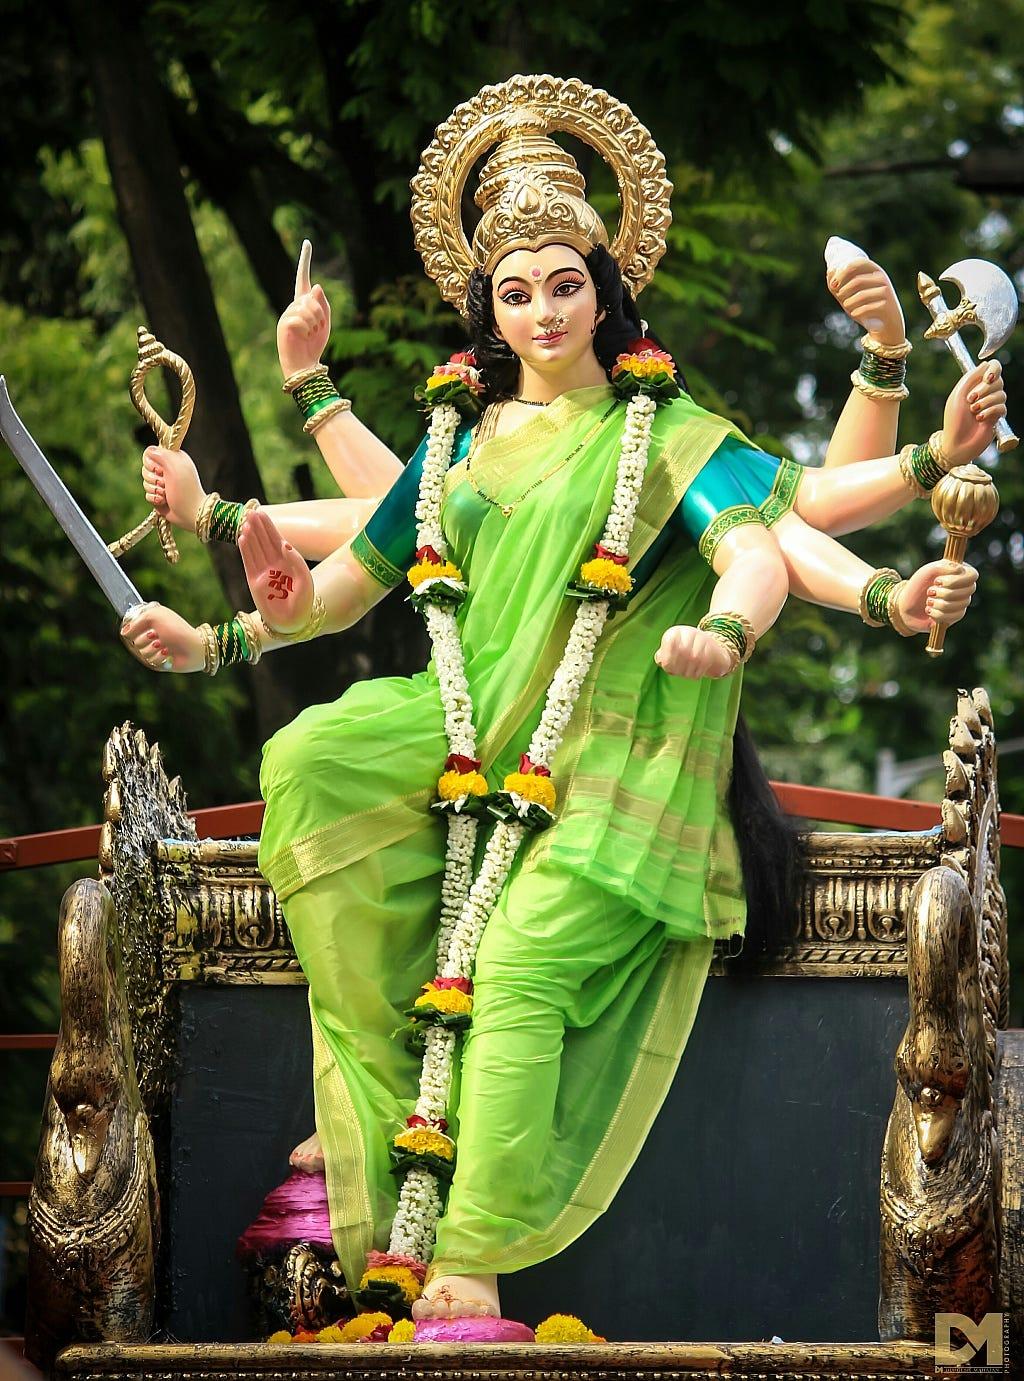 Jai Mata Di Hd Wallpaper This Is How India Celebrates Navratri Durga Puja Festival